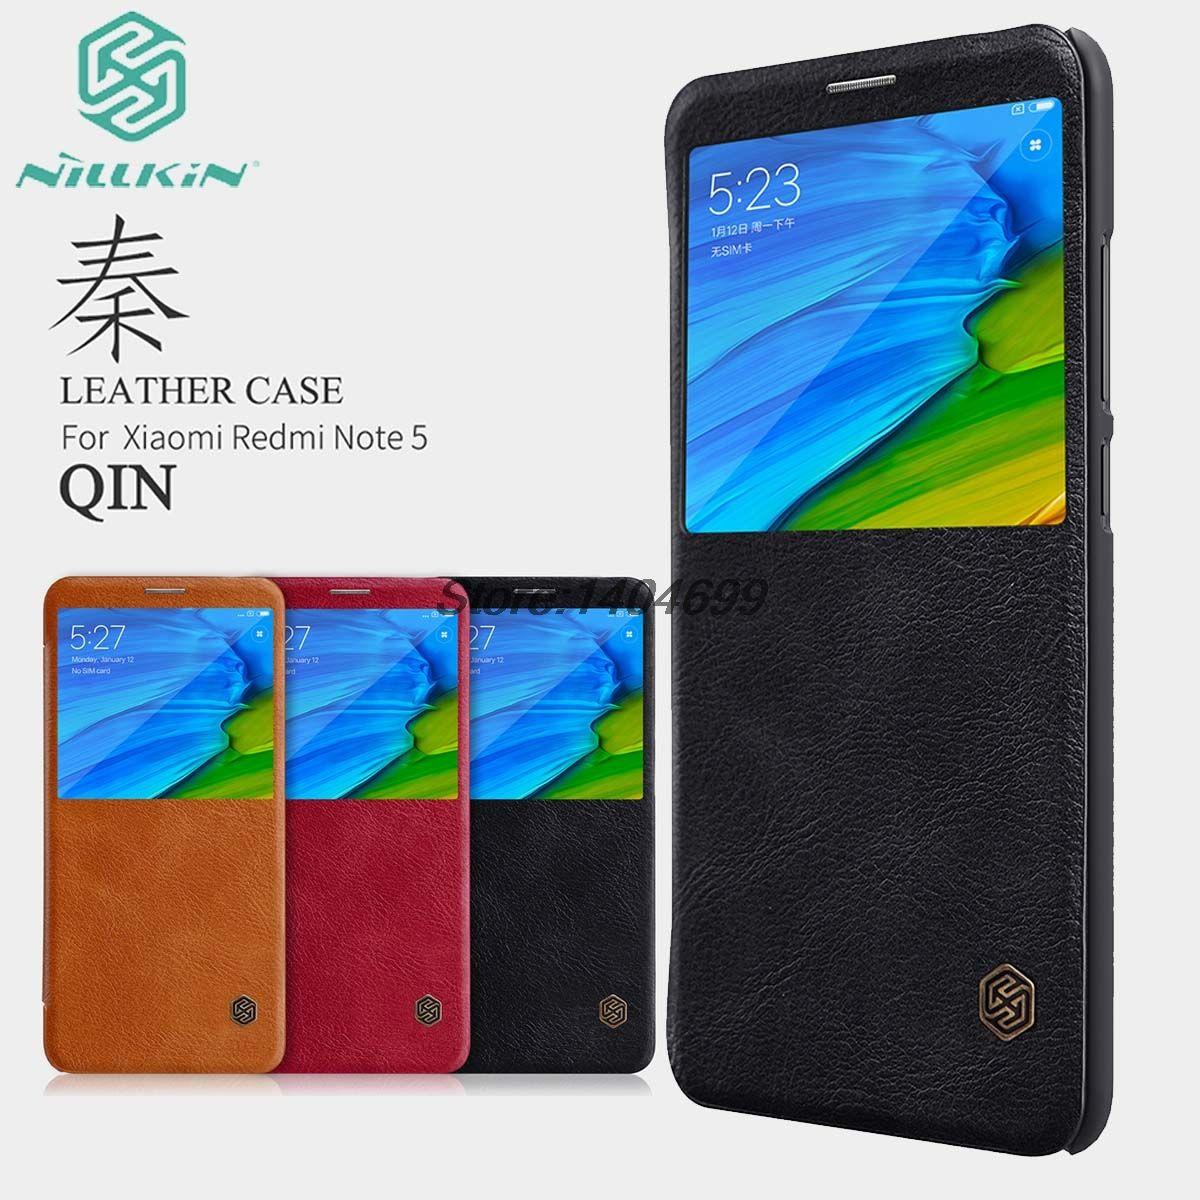 Xiaomi Redmi Note 5 Pro Flip Case Xiaomi Redmi Note 5 Case Nillkin Qin Series PU Leather Cover Case For Xiaomi Redmi Note 5 Pro